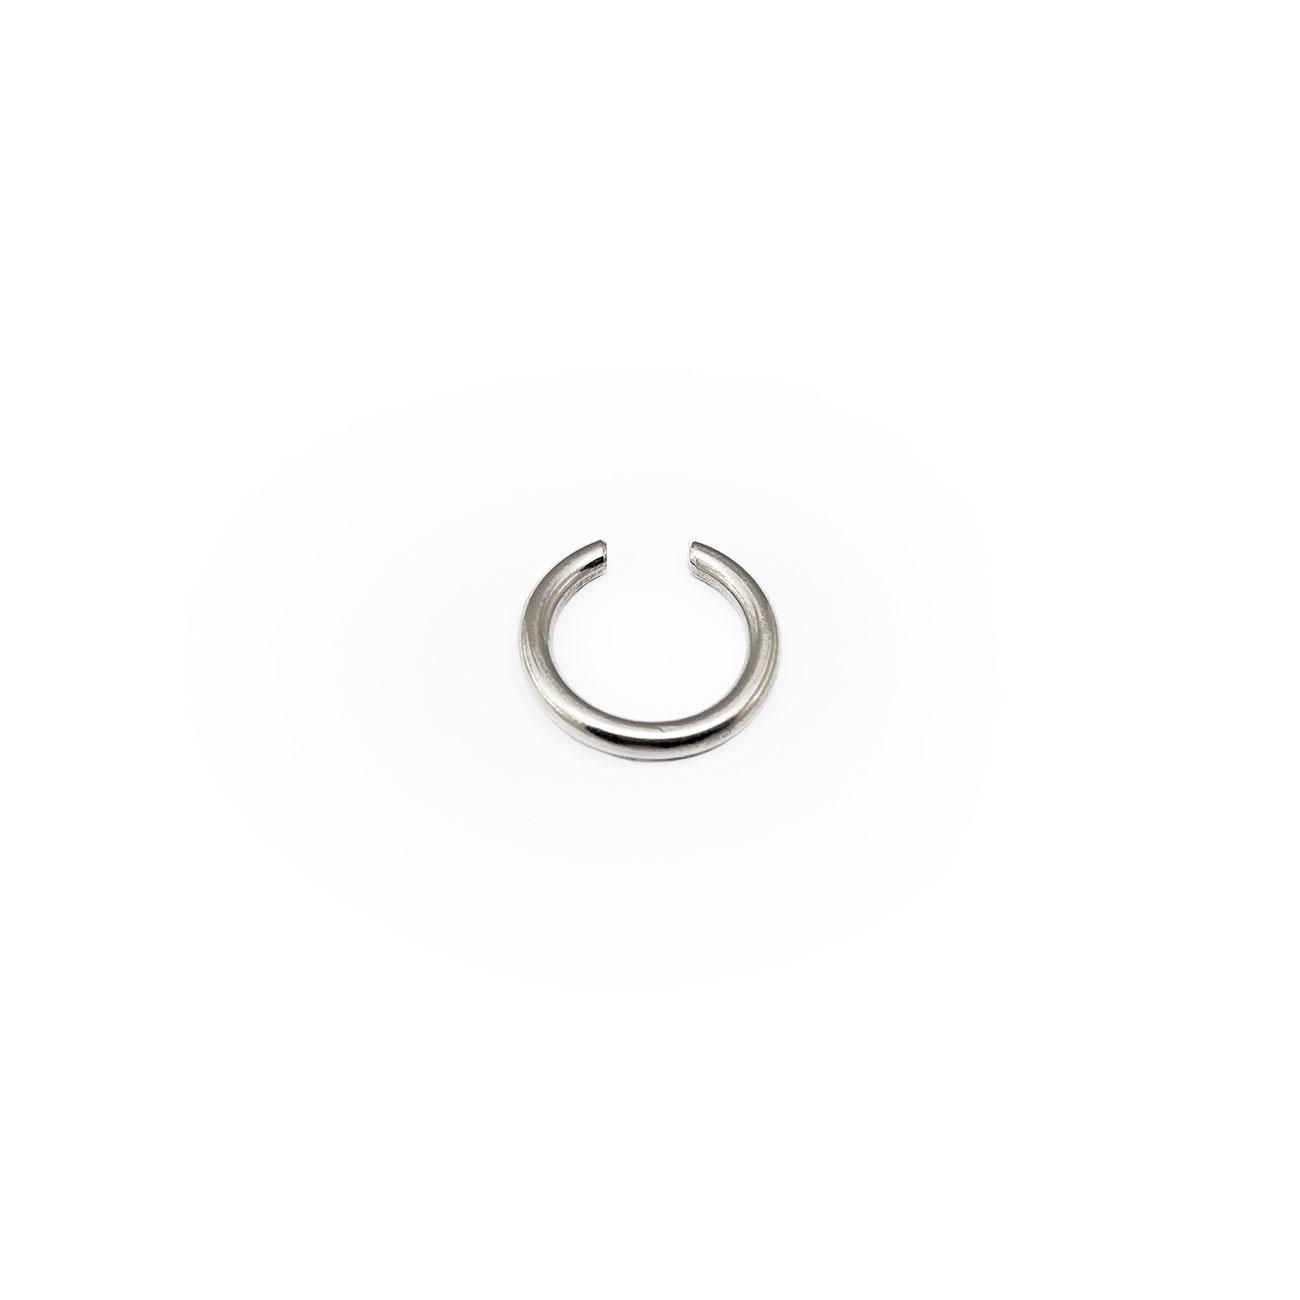 metaformi_design_jewelry_loop_small_silver_ear_cuff